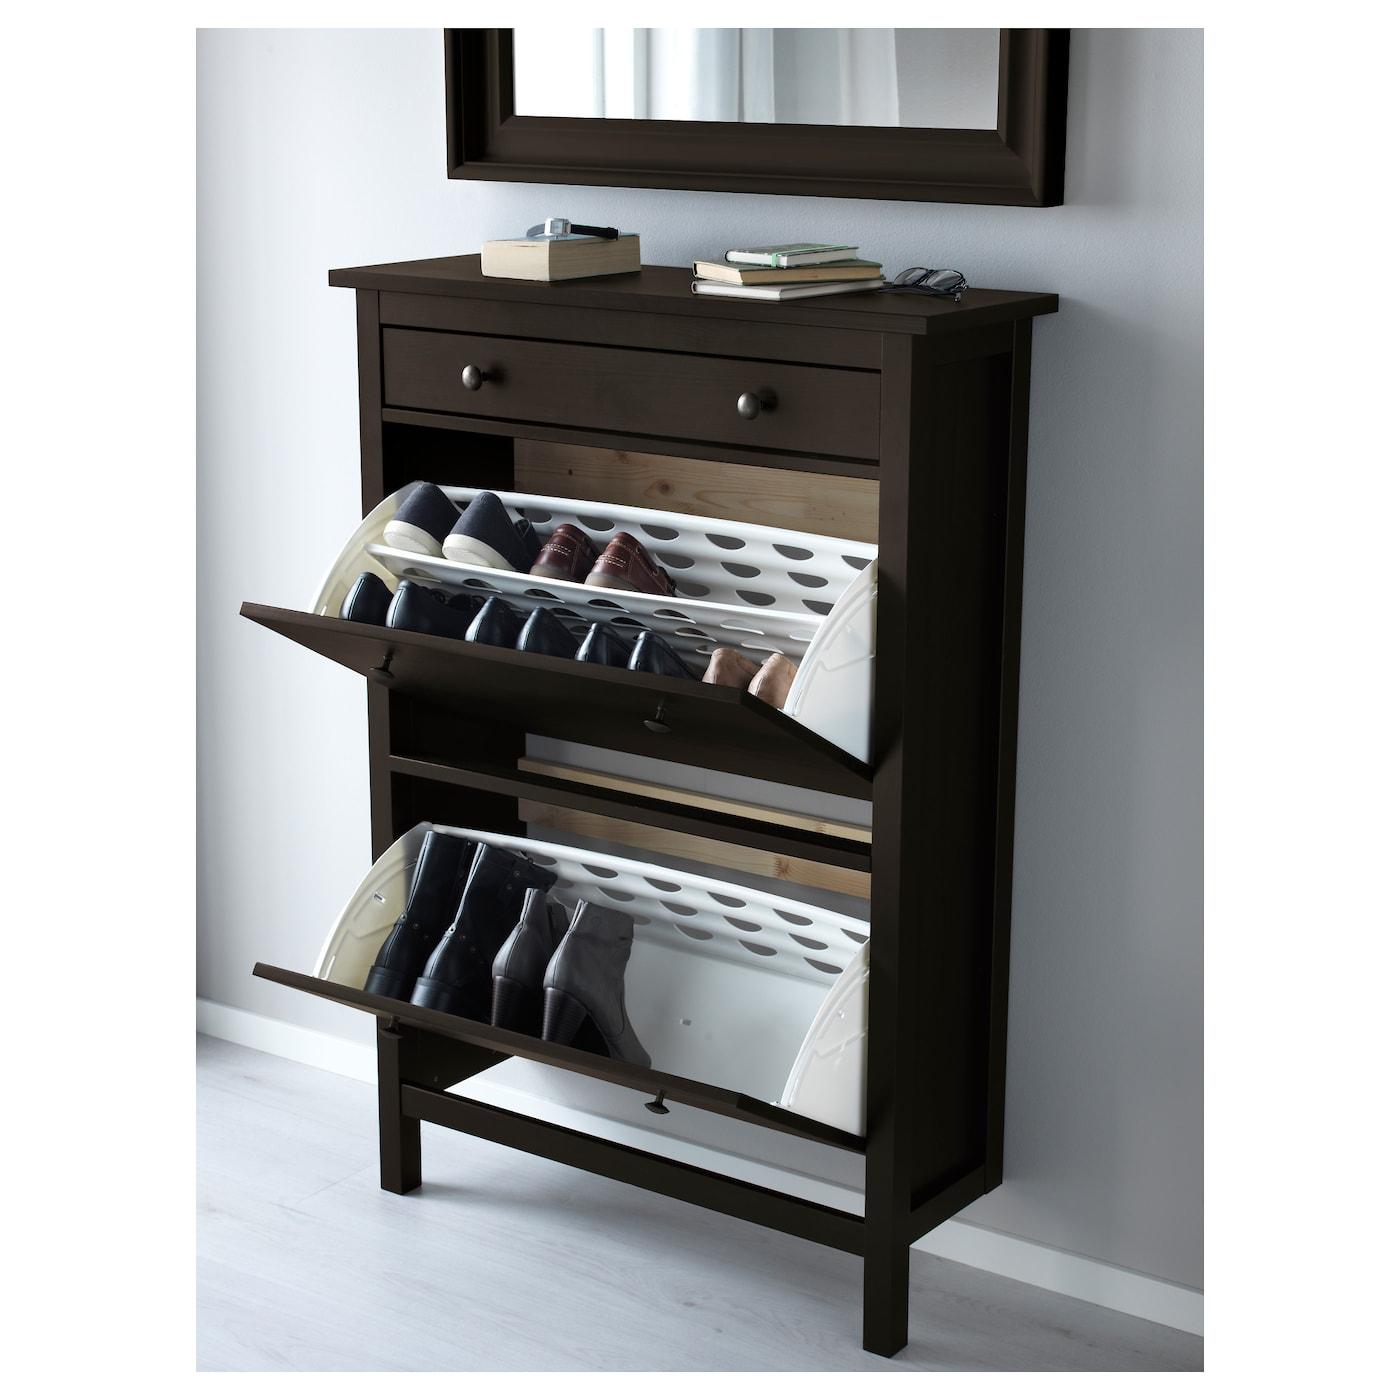 Fantastic Hemnes Shoe Cabinet With 2 Compartments Black Brown Download Free Architecture Designs Grimeyleaguecom